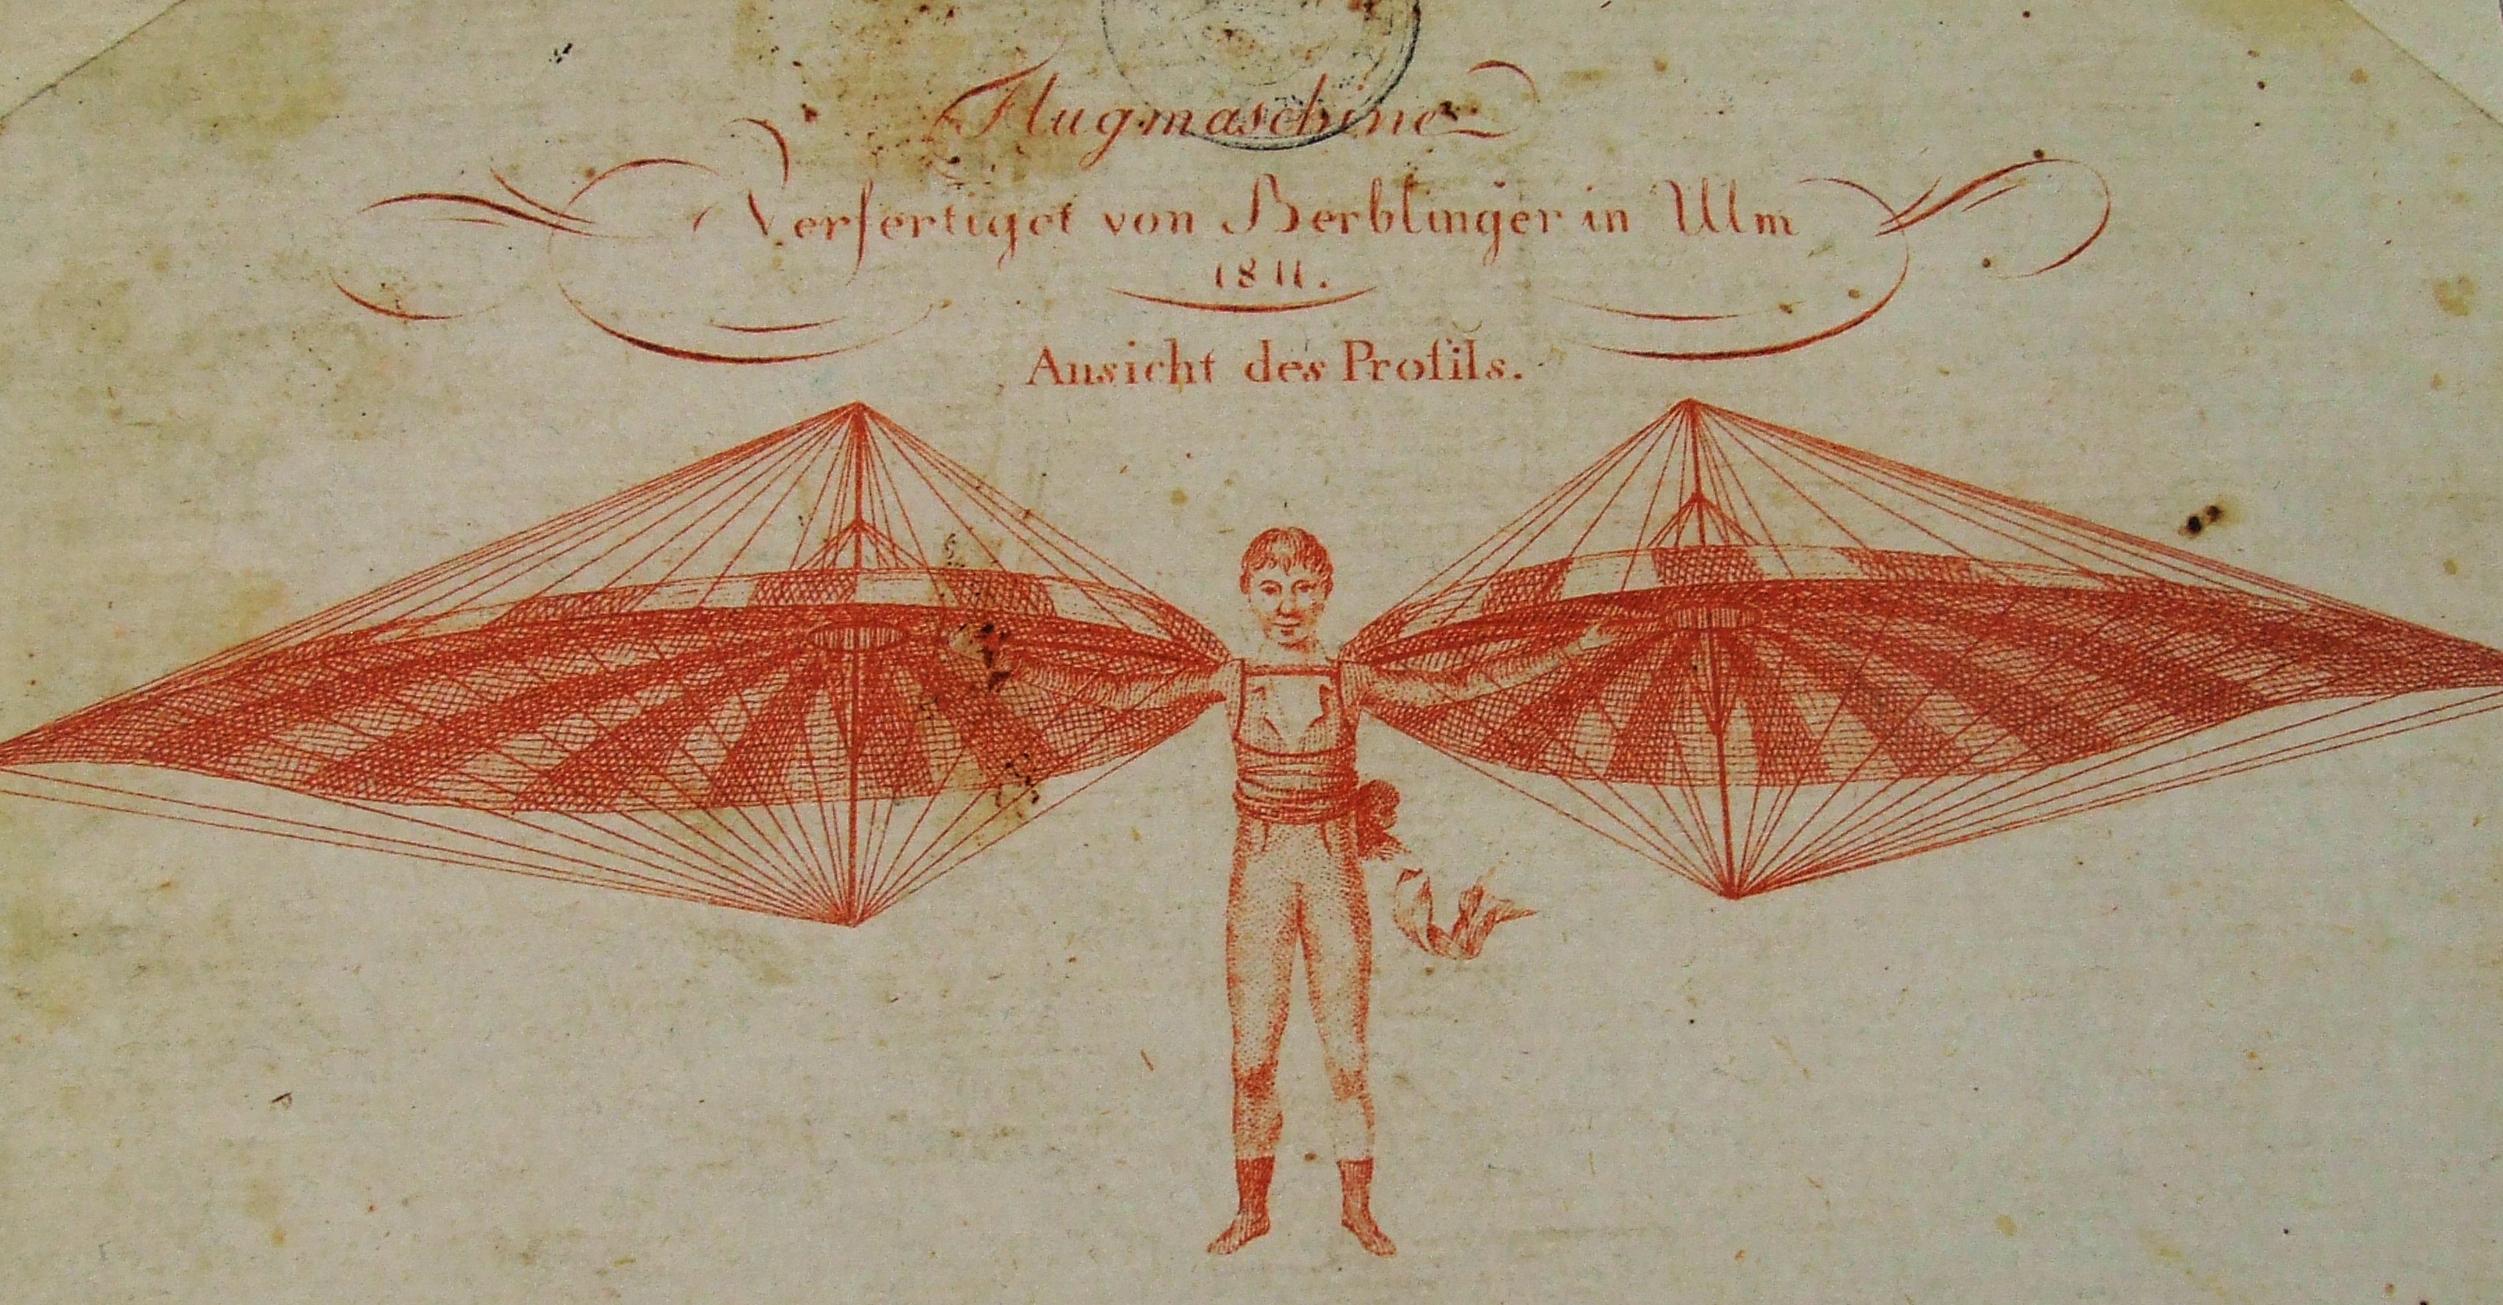 Ichnographia Bibliothecae christophe pittet yannick claessens